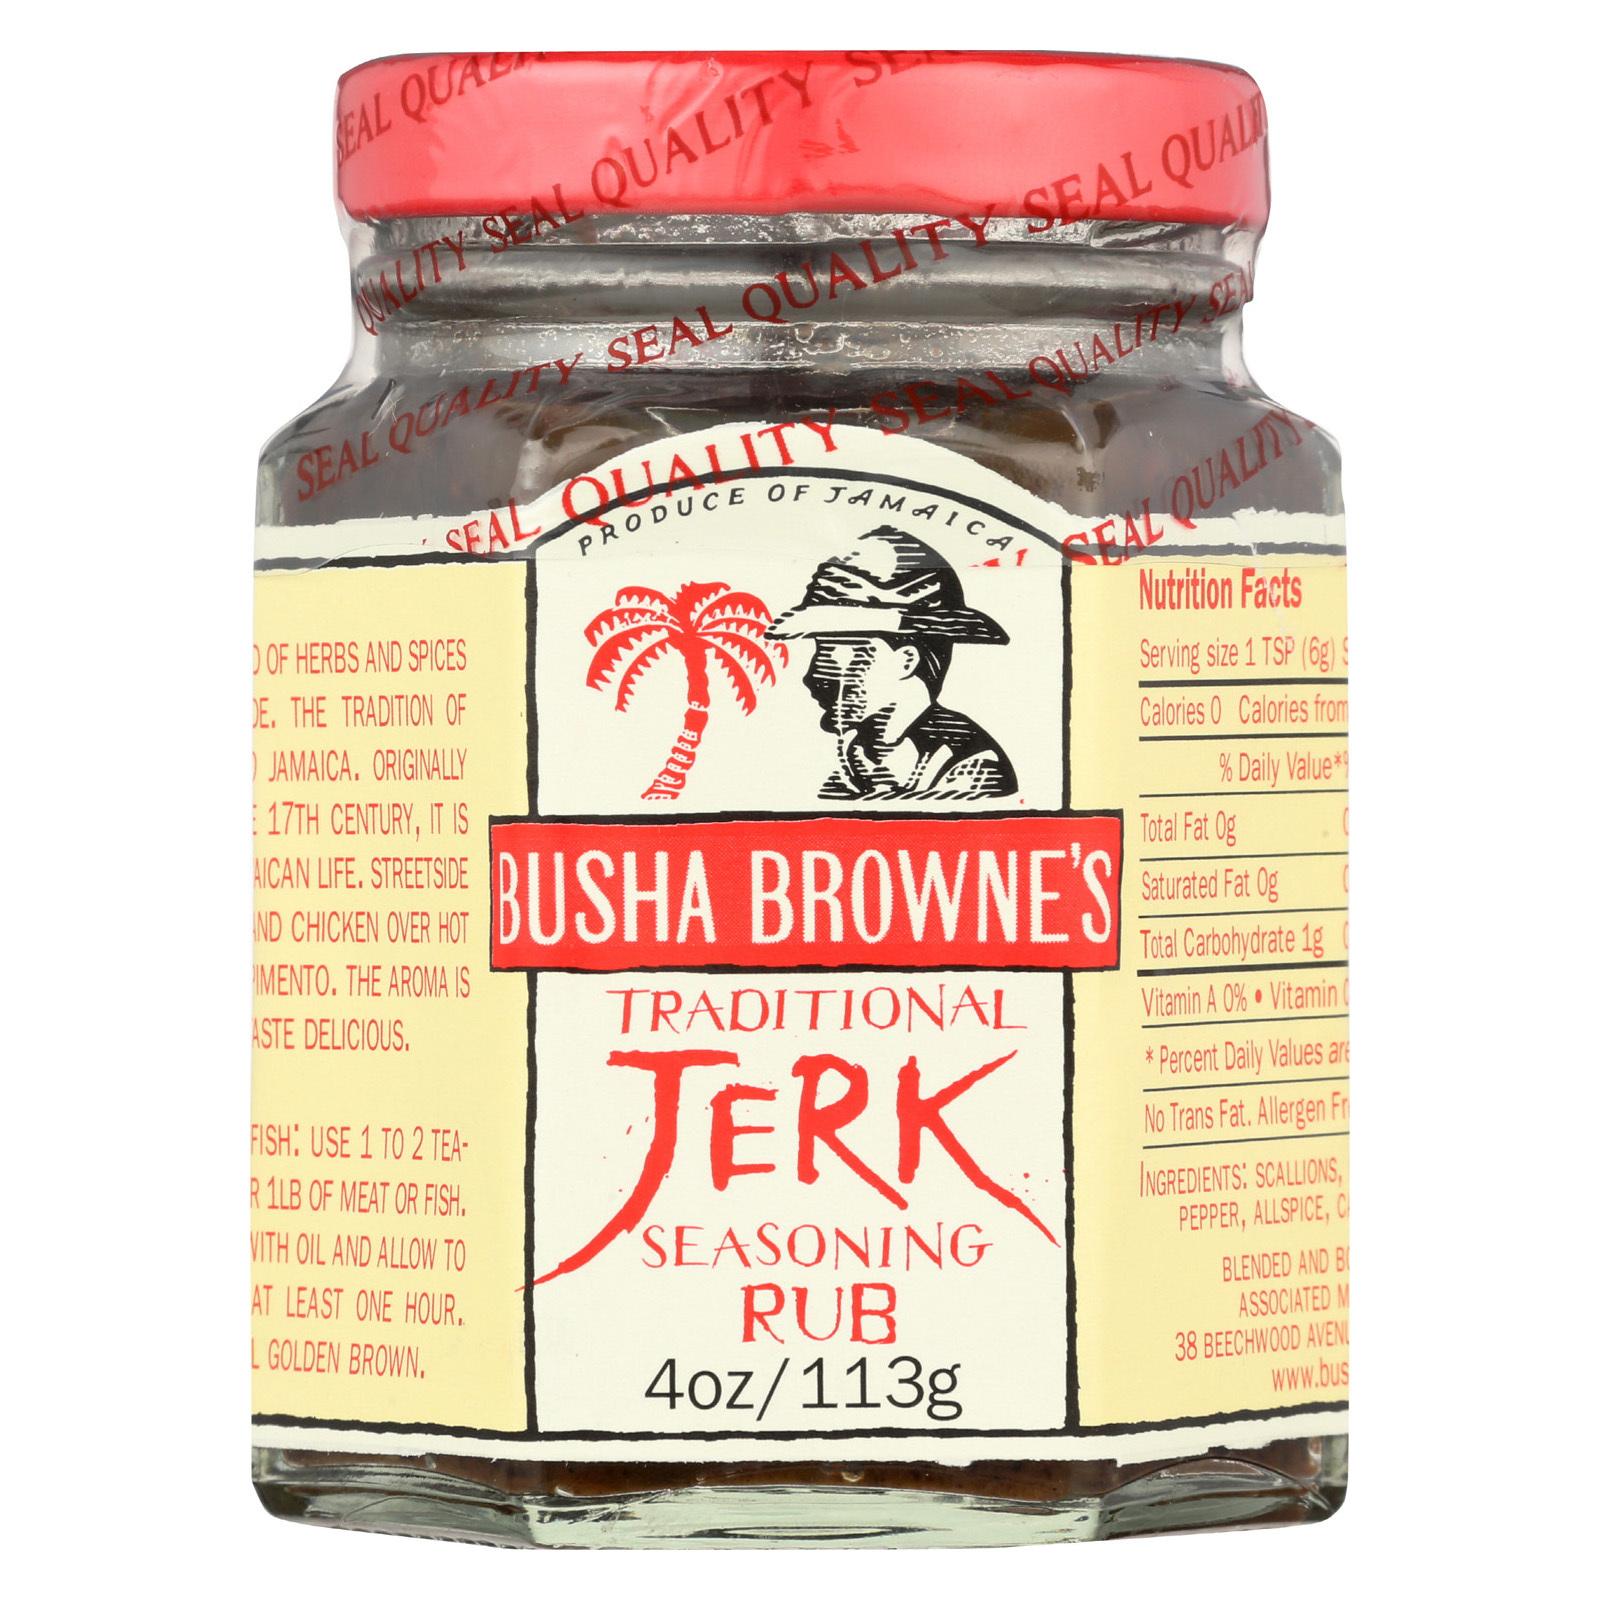 Busha Browne Jerk Seasoning -  Traditional - Case of 12 - 4 oz